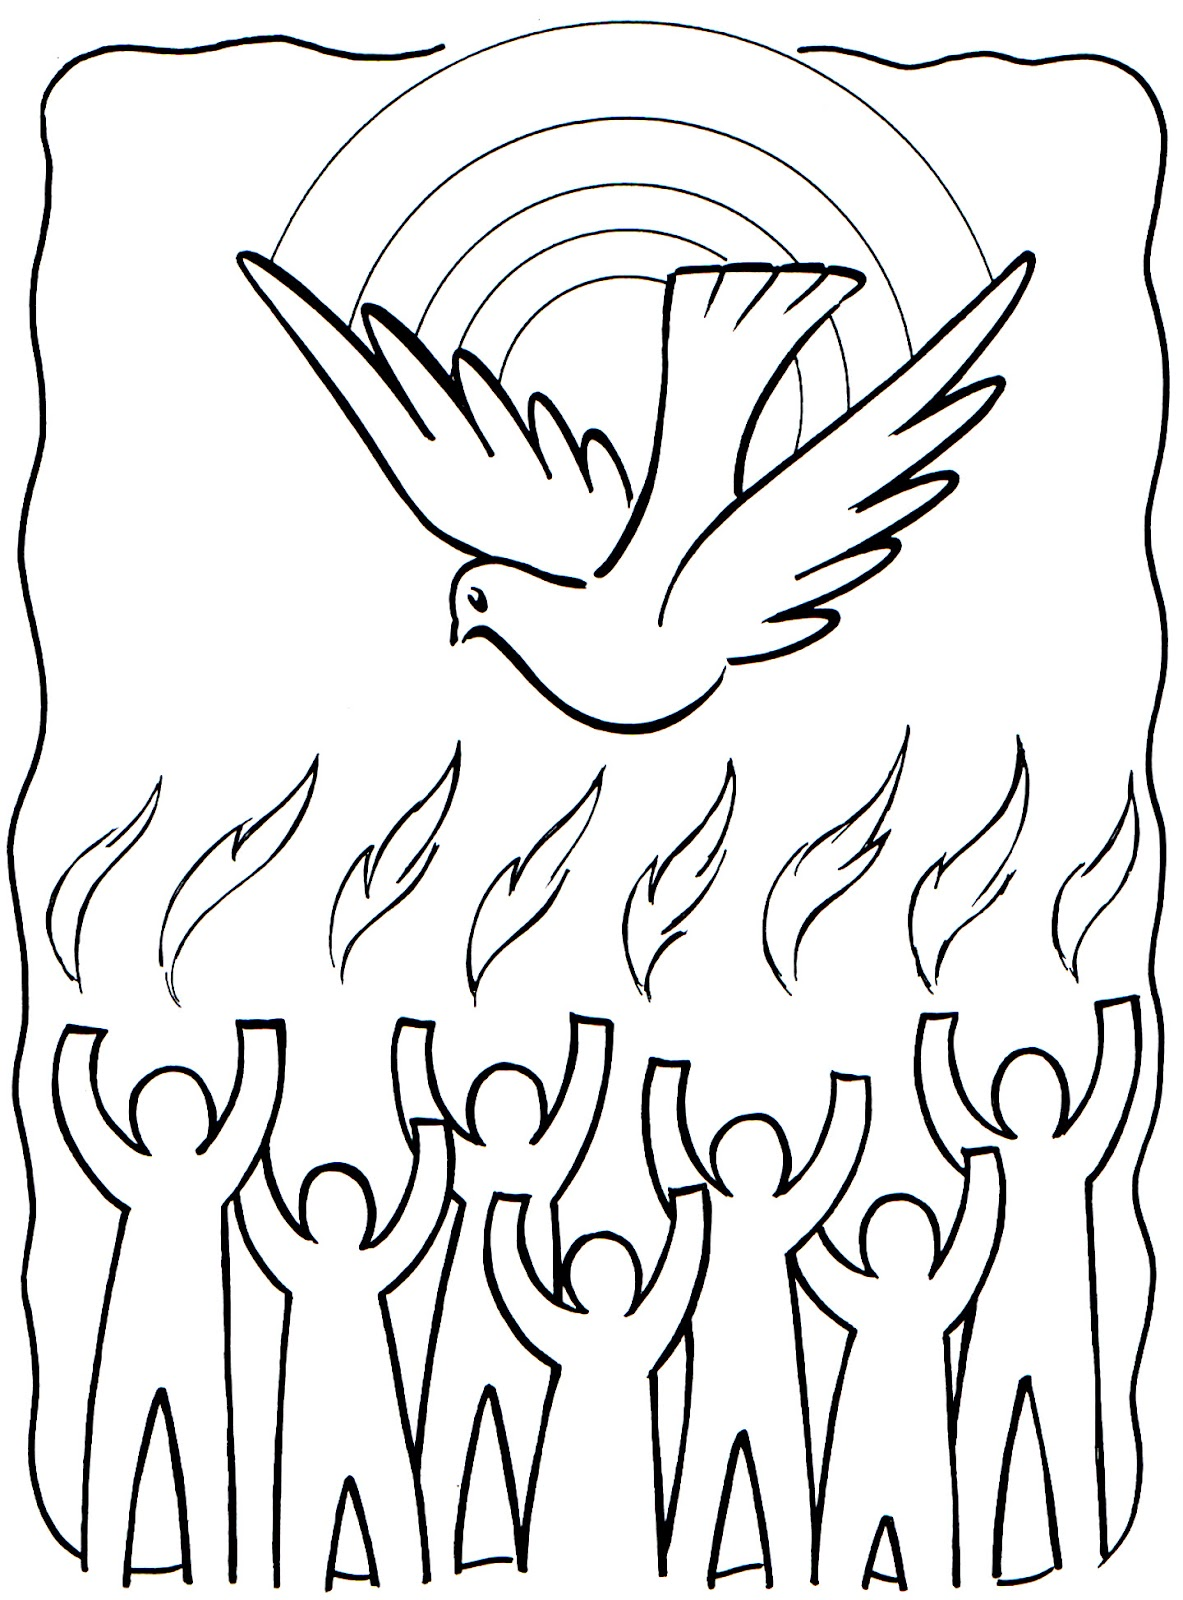 Relidesol Pentecostes